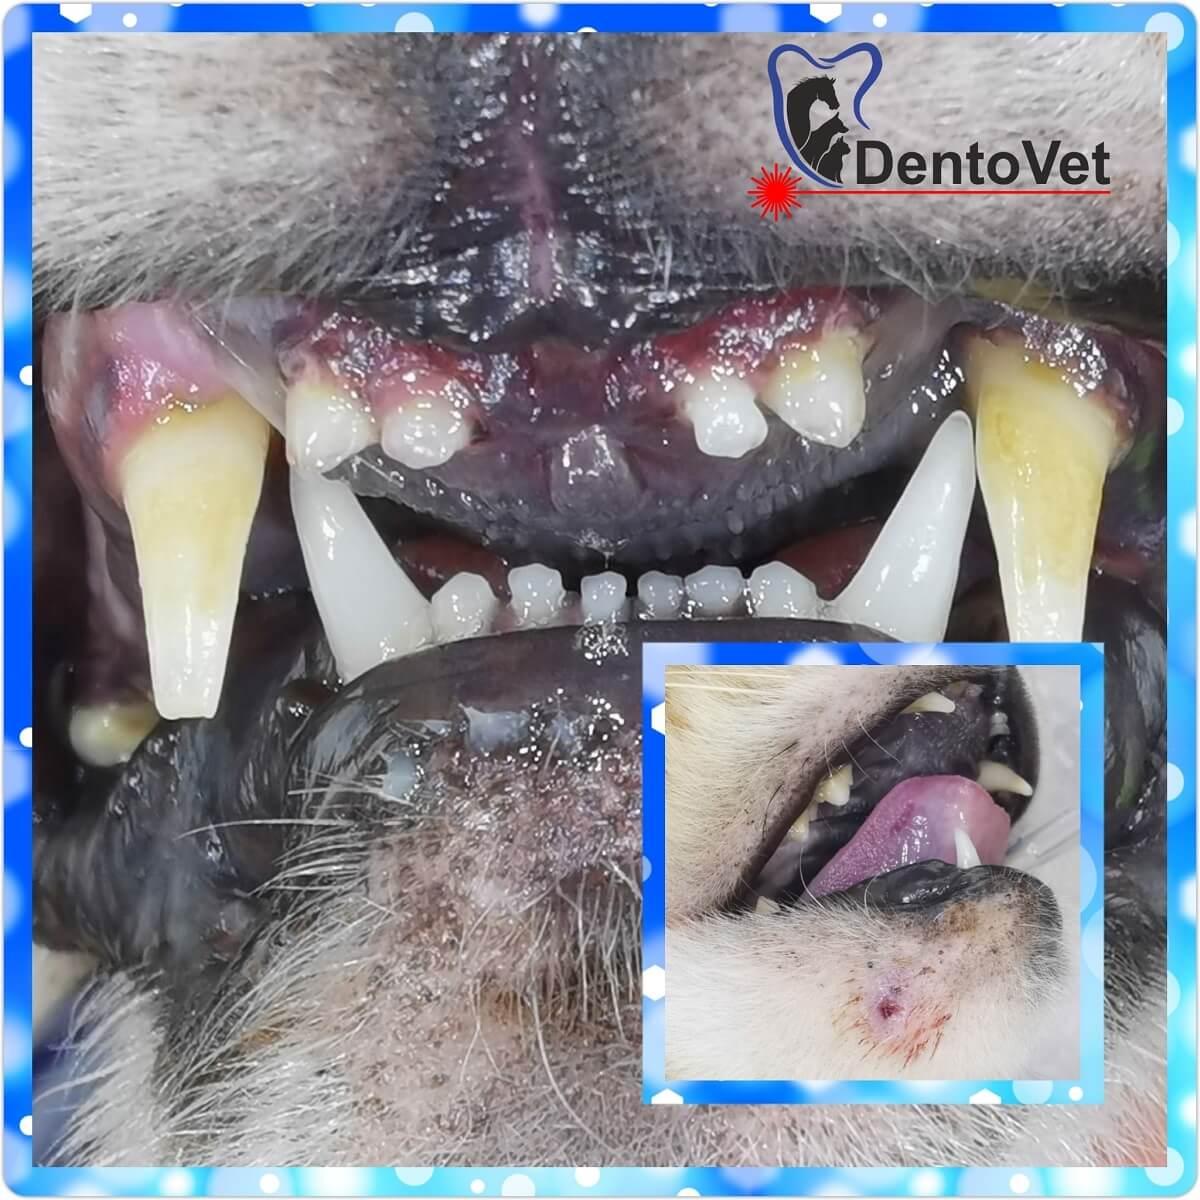 Stomatologie veterinara la bengaleza - situatie initiala